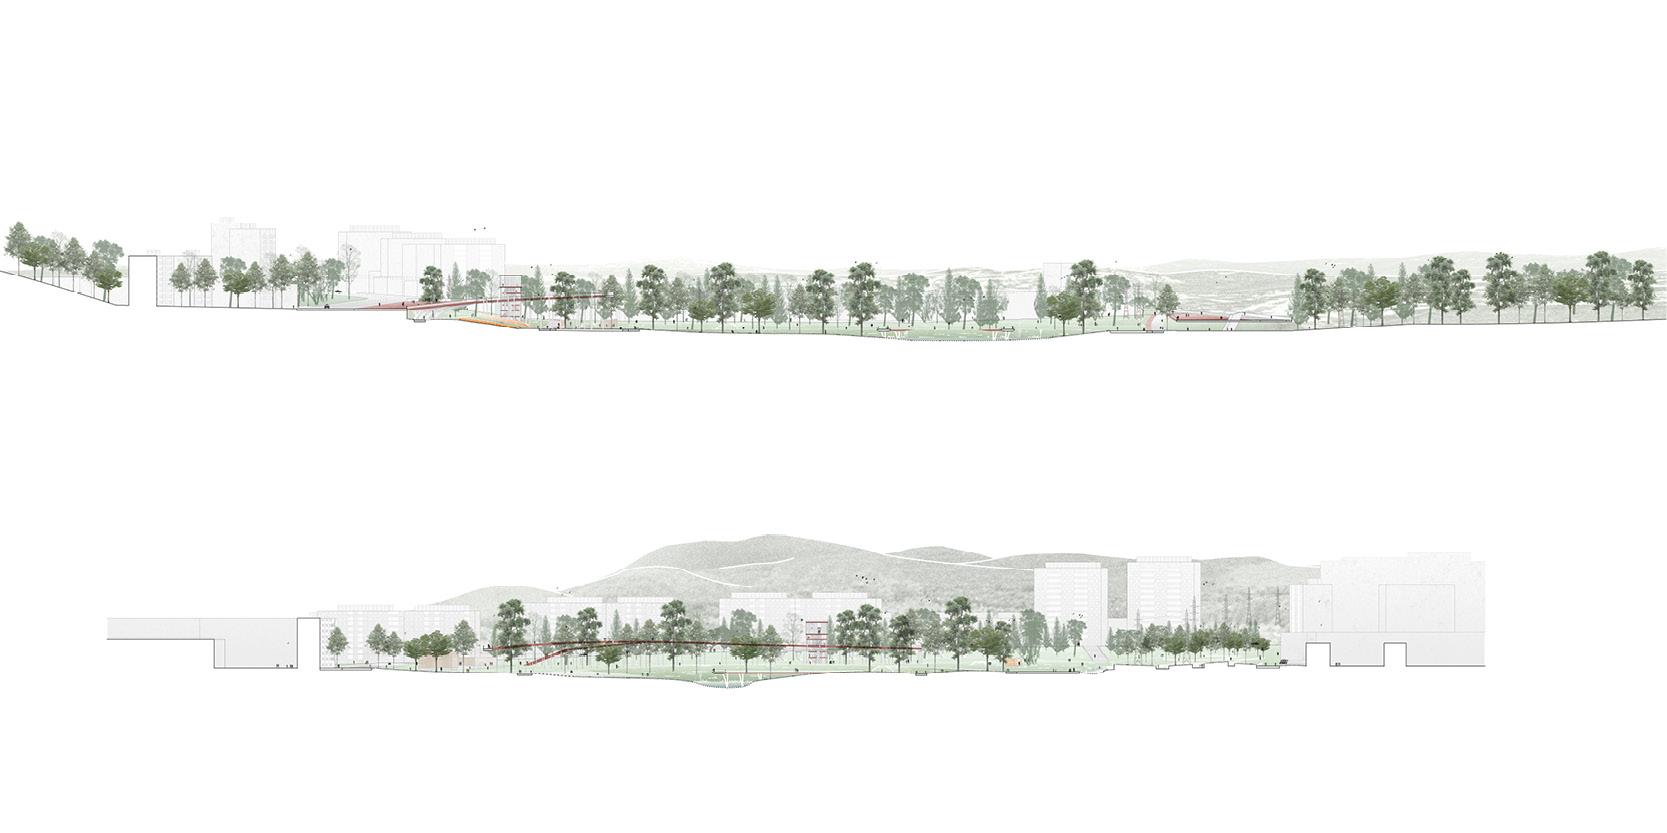 OCA architects Coziness Valley Долина Уюта competition Murmansk region Hernan Lleida Ruiz Bernardo Garcia Morales Miquel Perez Eric Moya20